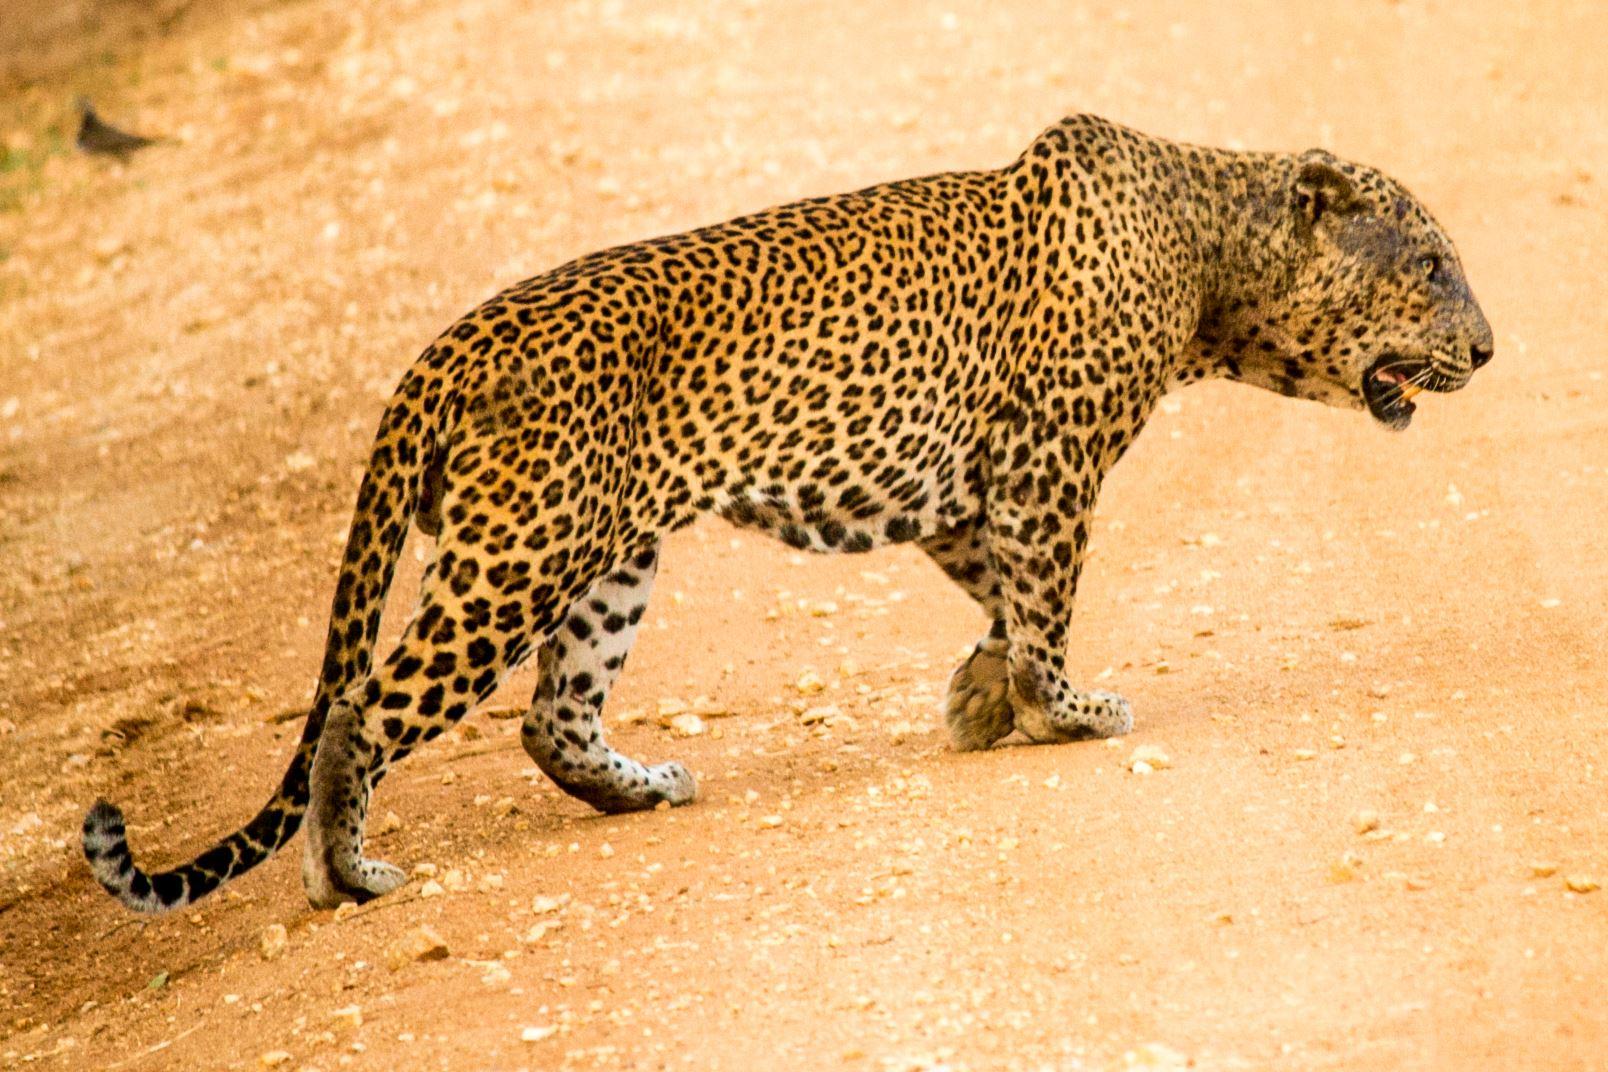 invite-to-paradise-sri-lanka-and-maldives-specialists-travel-agent-tour-operator-customer-review-feedback-joel-rhian-leopard-4.jpg